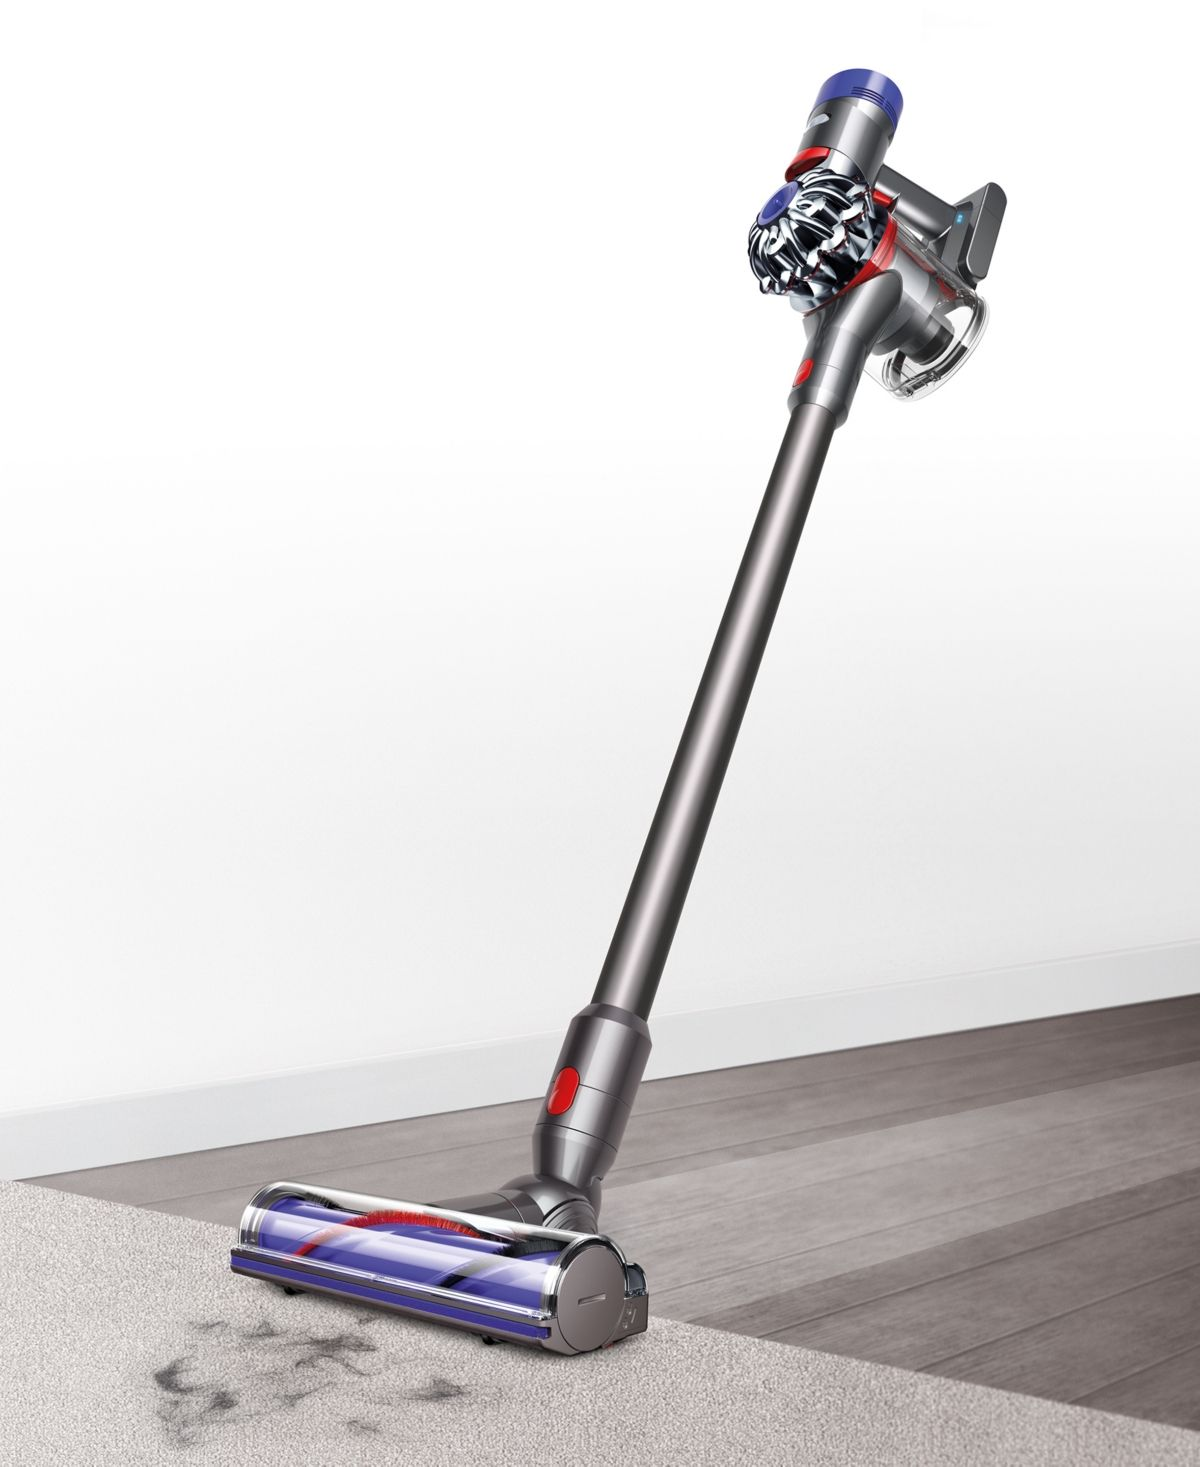 Dyson V7 Animal Cordless Vacuum Iron Cordless vacuum